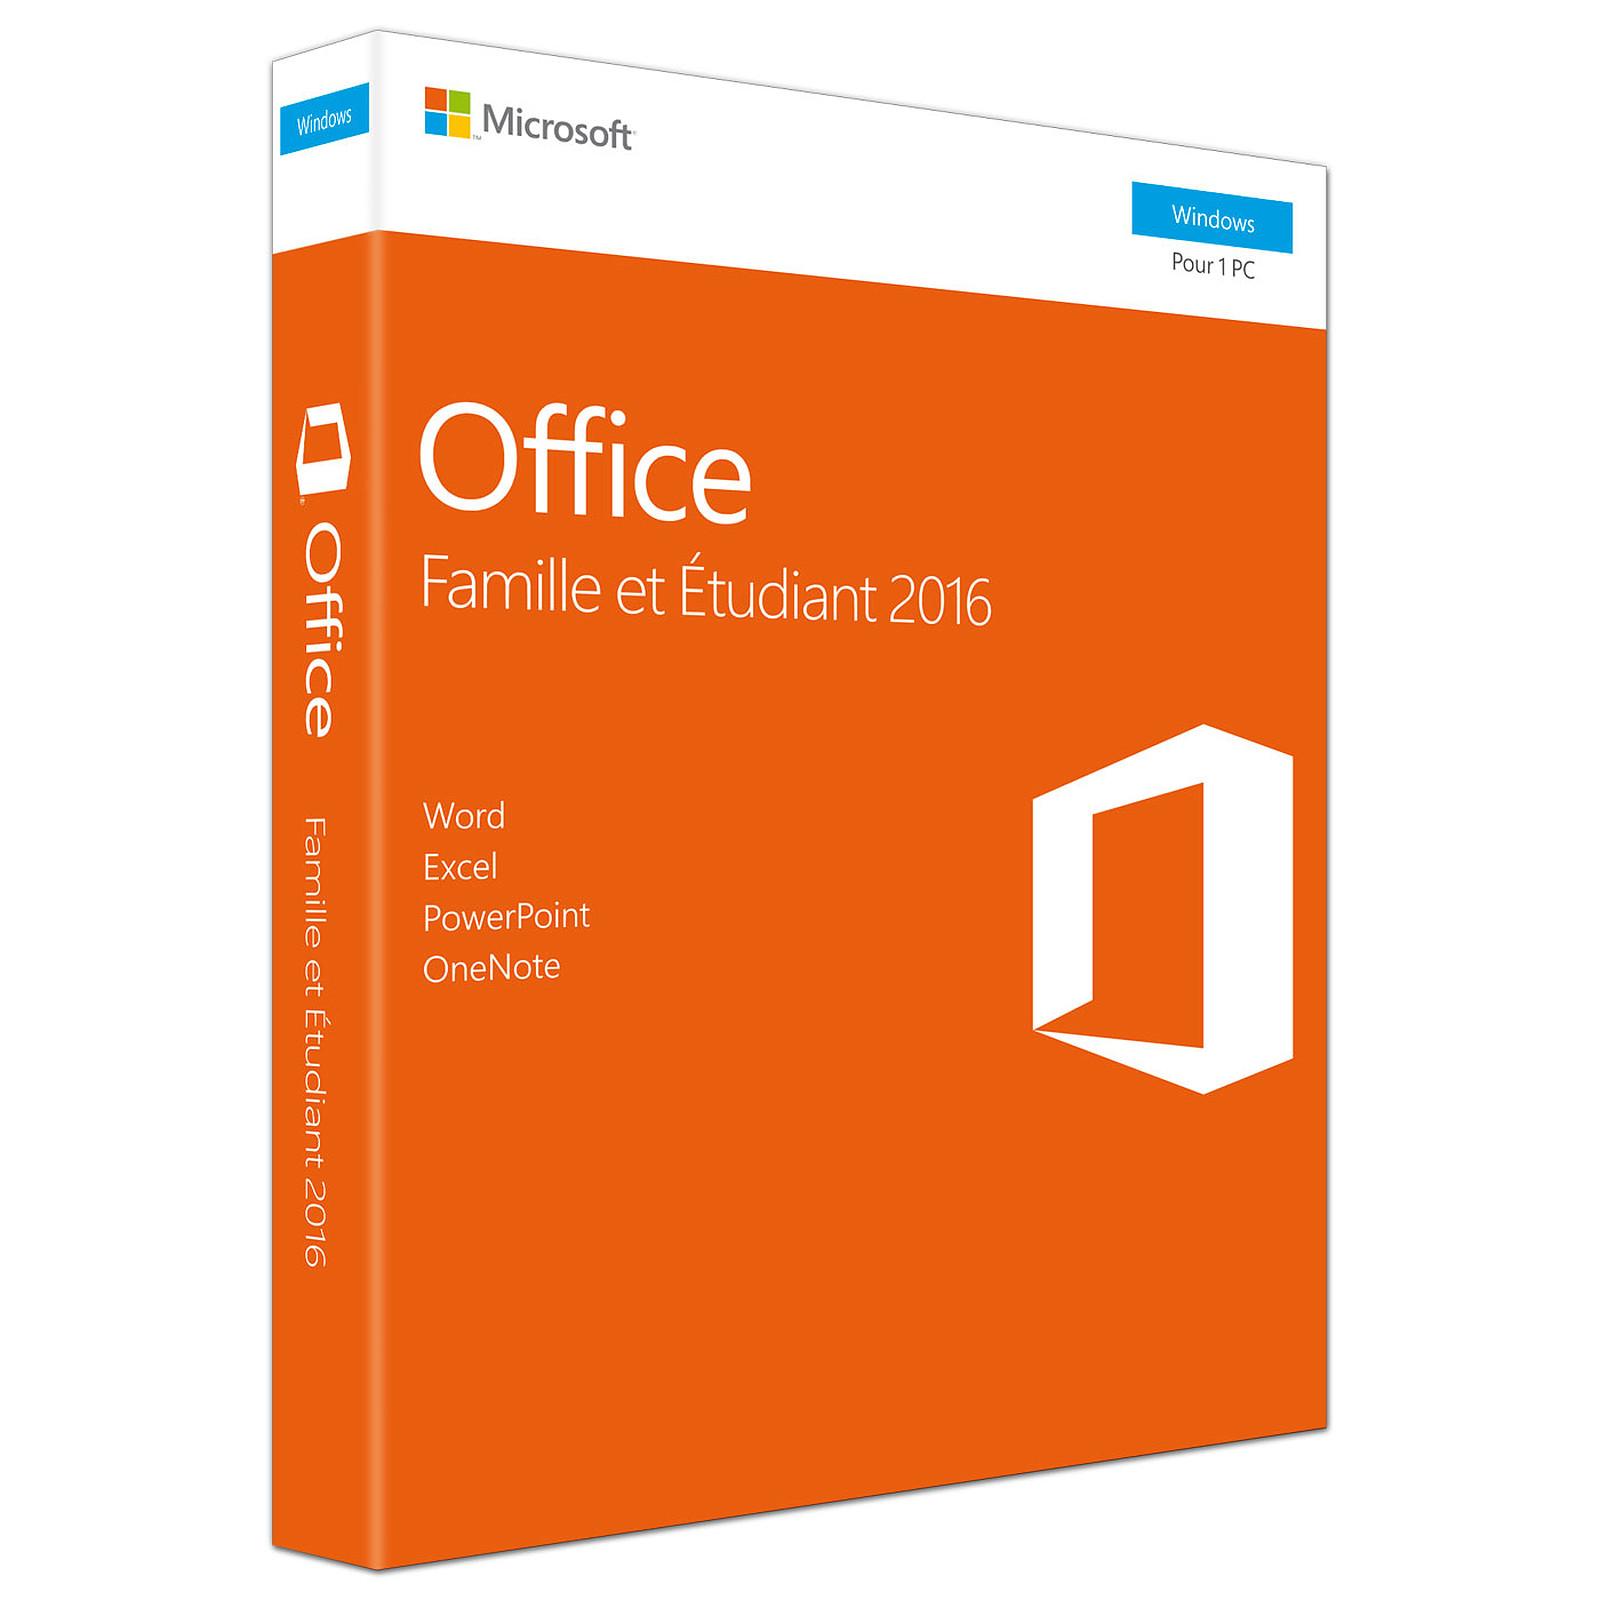 Microsoft Office Famille Et Etudiant 2016